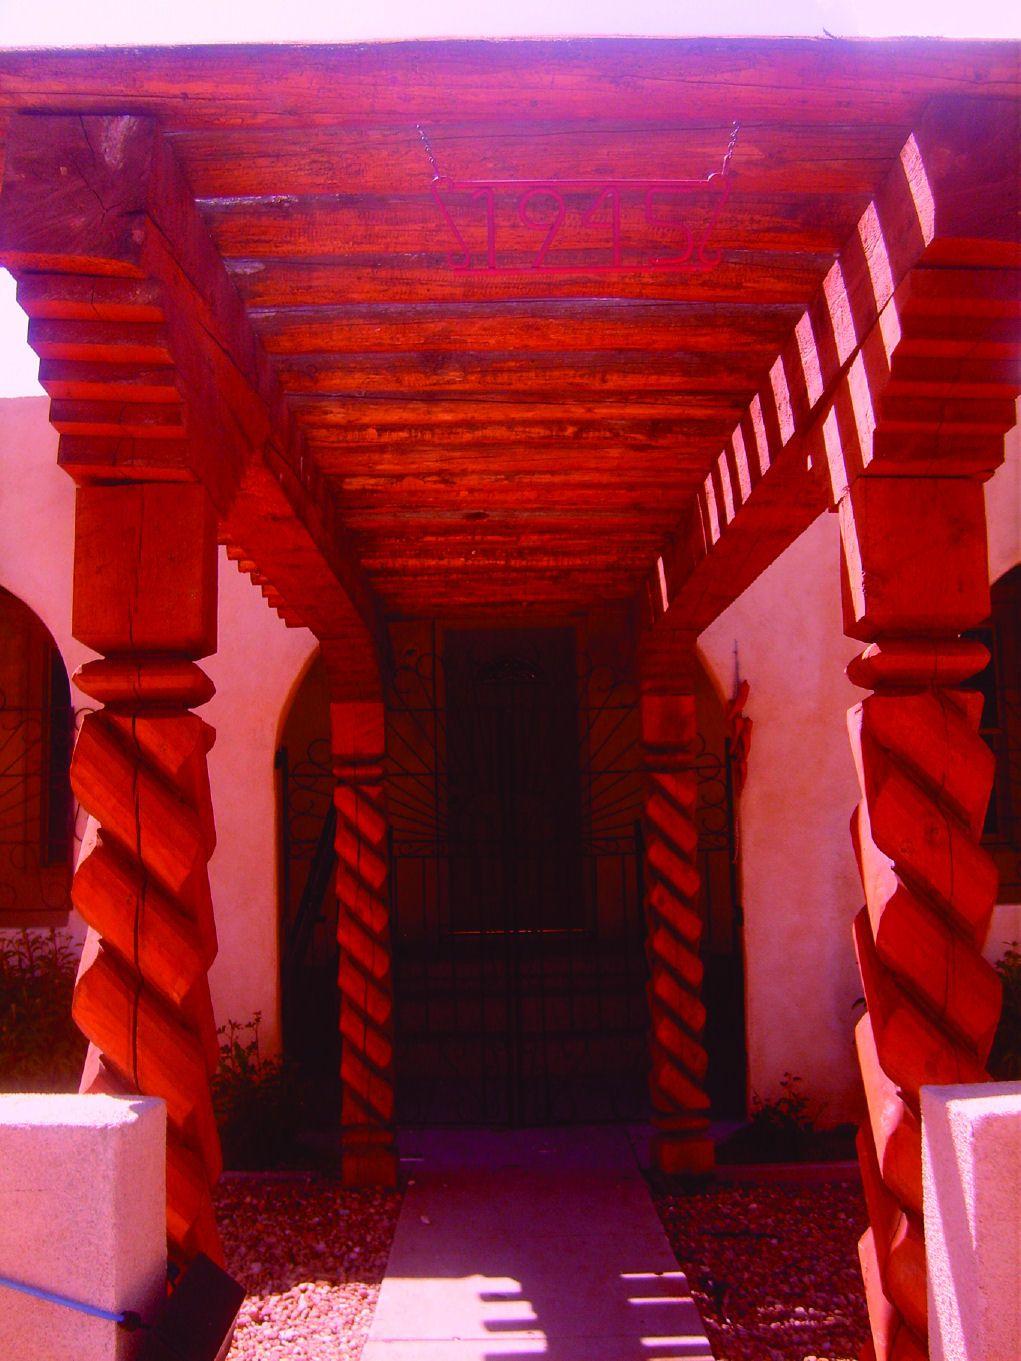 Southwest Post Designs - Wood Posts, Vigas, Beams, Corbels, Mantels, Mailbox Posts, Pergolas, and Gazebos